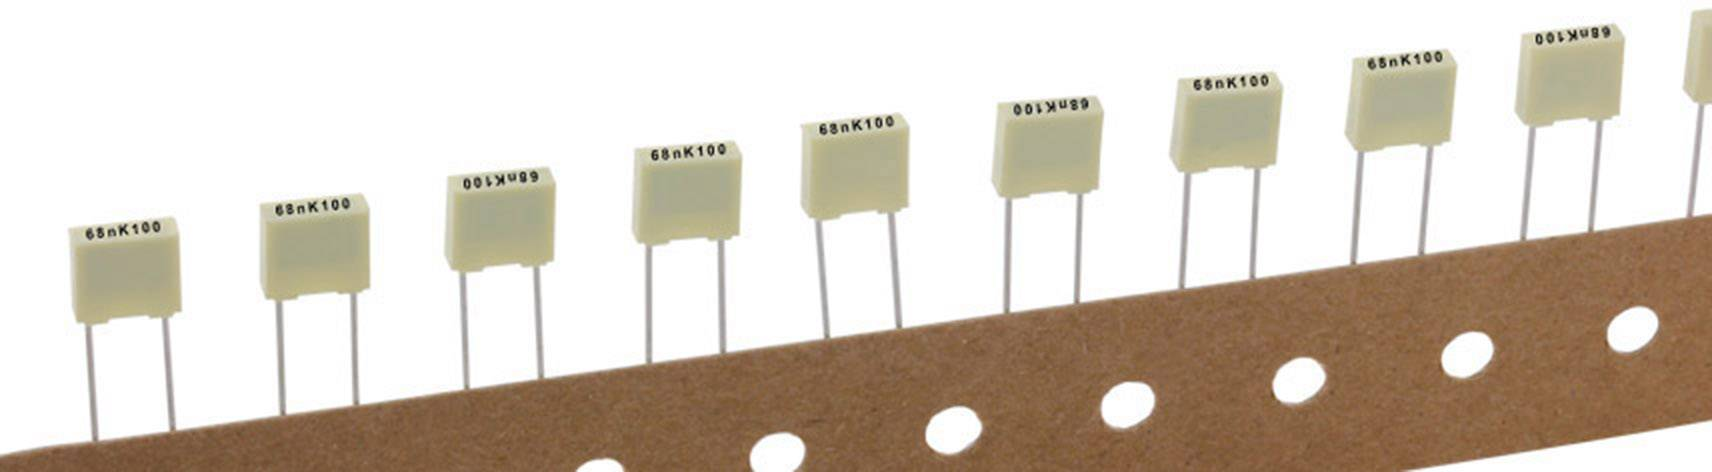 Polyesterový kondenzátor Kemet R82EC2330DQ50K+ radiálne vývody, 33 nF, 100 V,10 %, 5 mm, (d x š x v) 7.2 x 2.5 mm x 6.5 mm, 1 ks